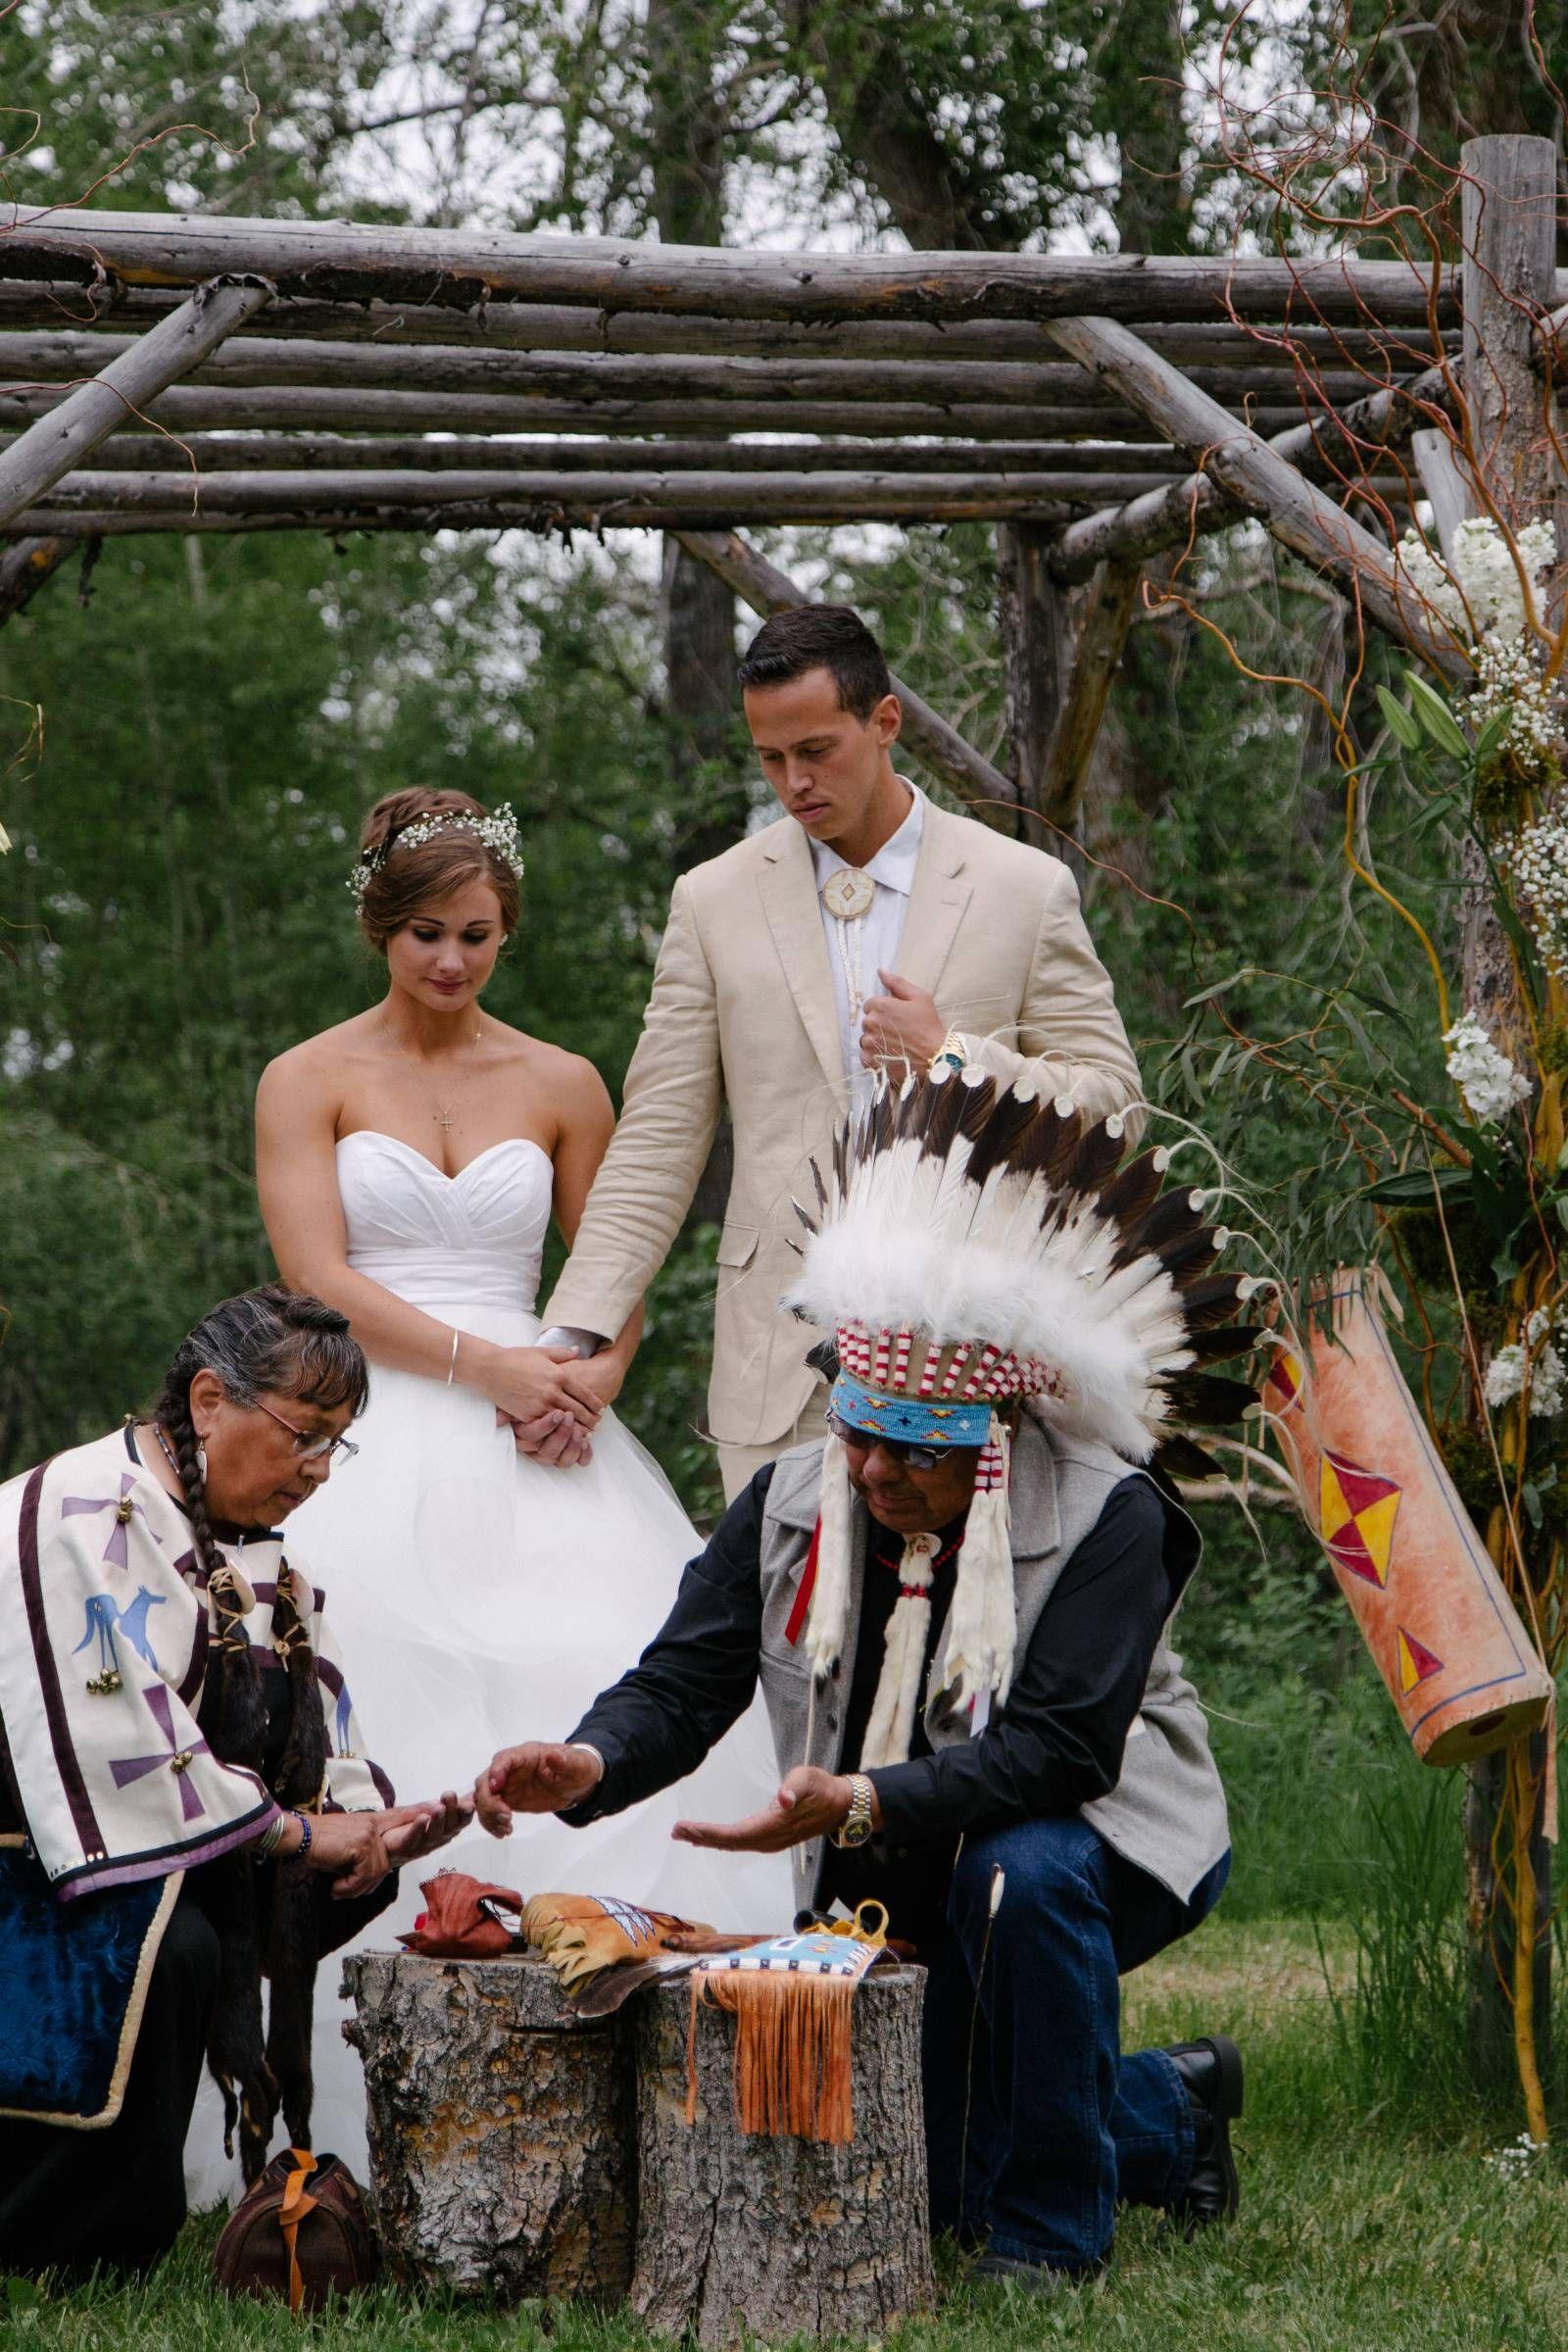 Rocky Mountain Bride Wedding Inspiration Local Vendors Events Native American Wedding American Wedding Mountain Bride